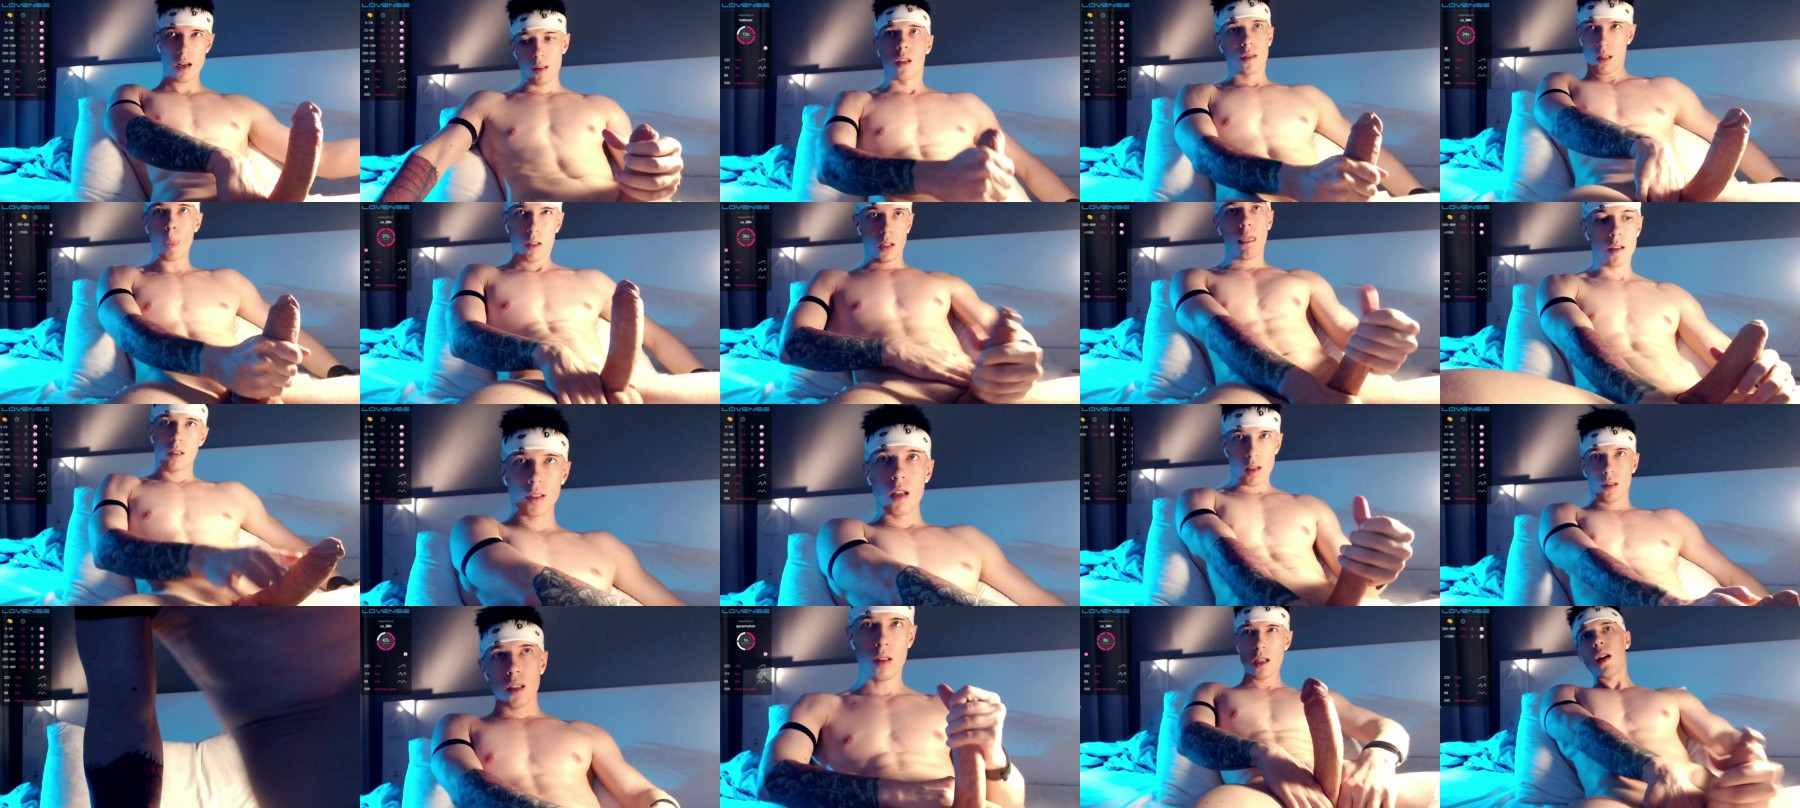 Briannhardone Chaturbate 08-06-2021 Male Webcam